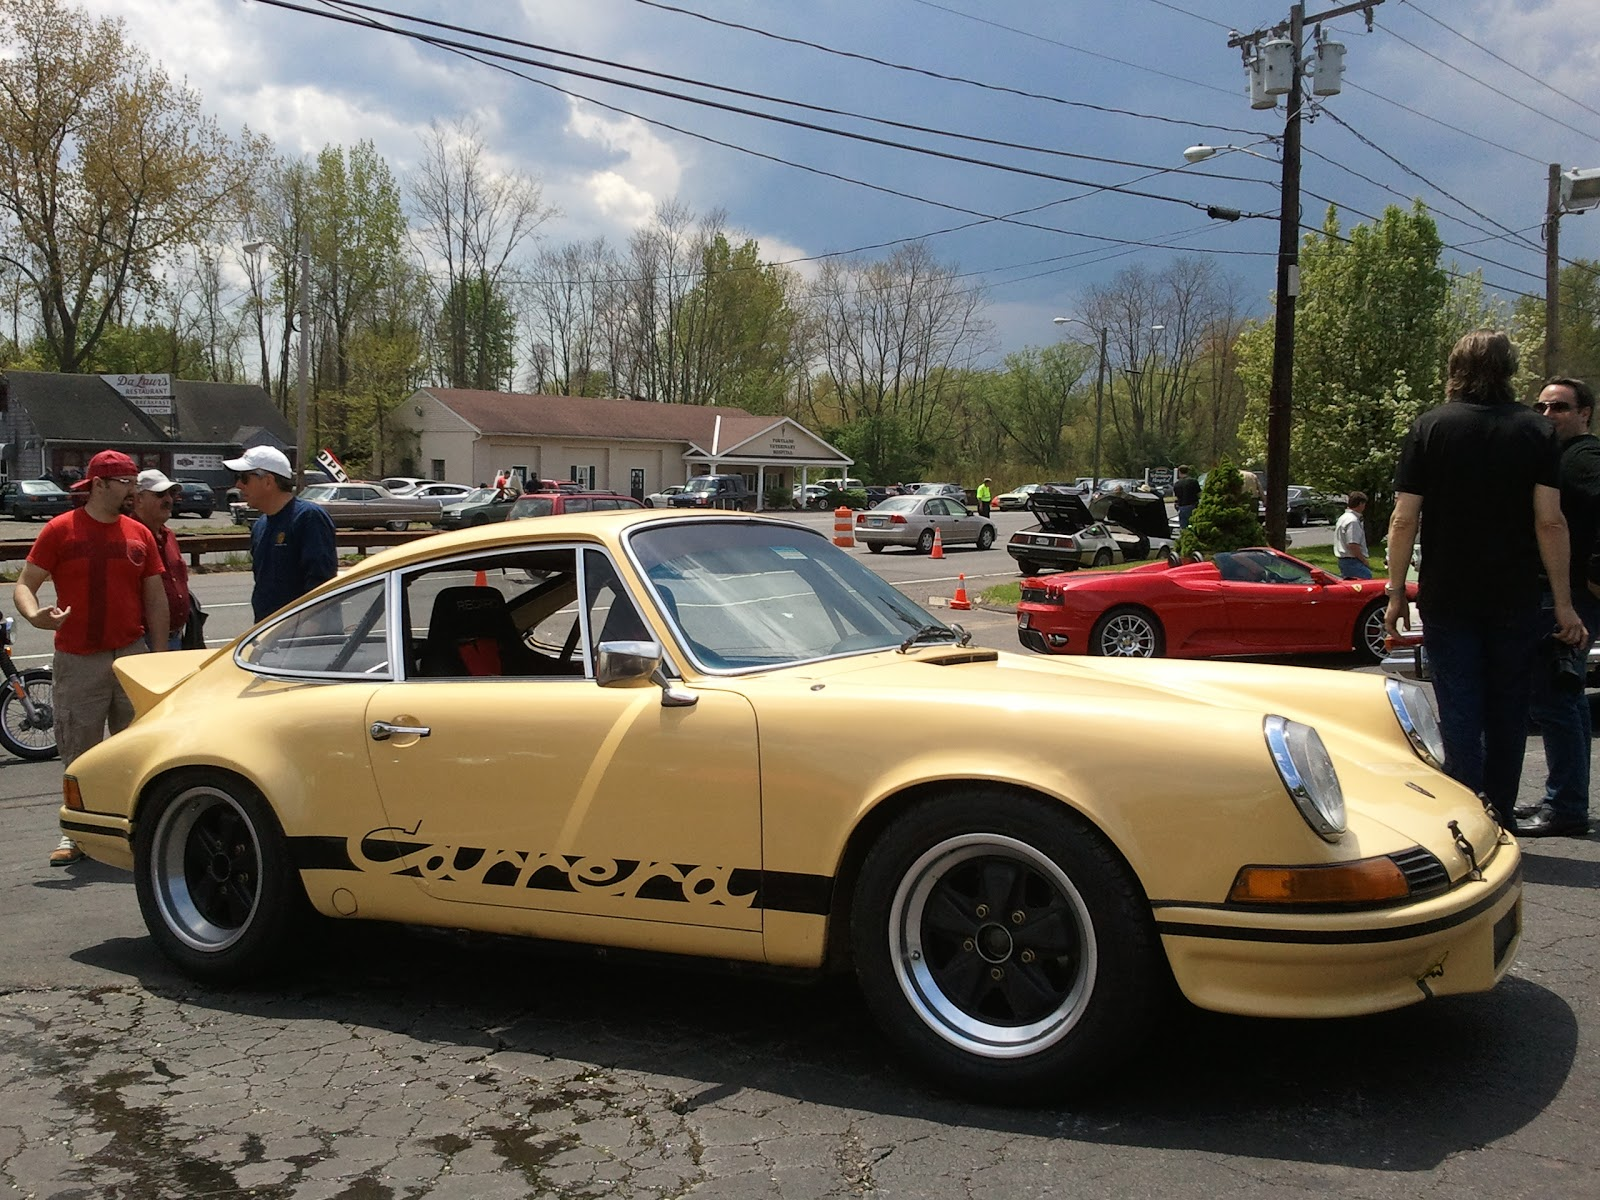 The Borger Speaks: Wayne Carini Of Chasing Classic Cars